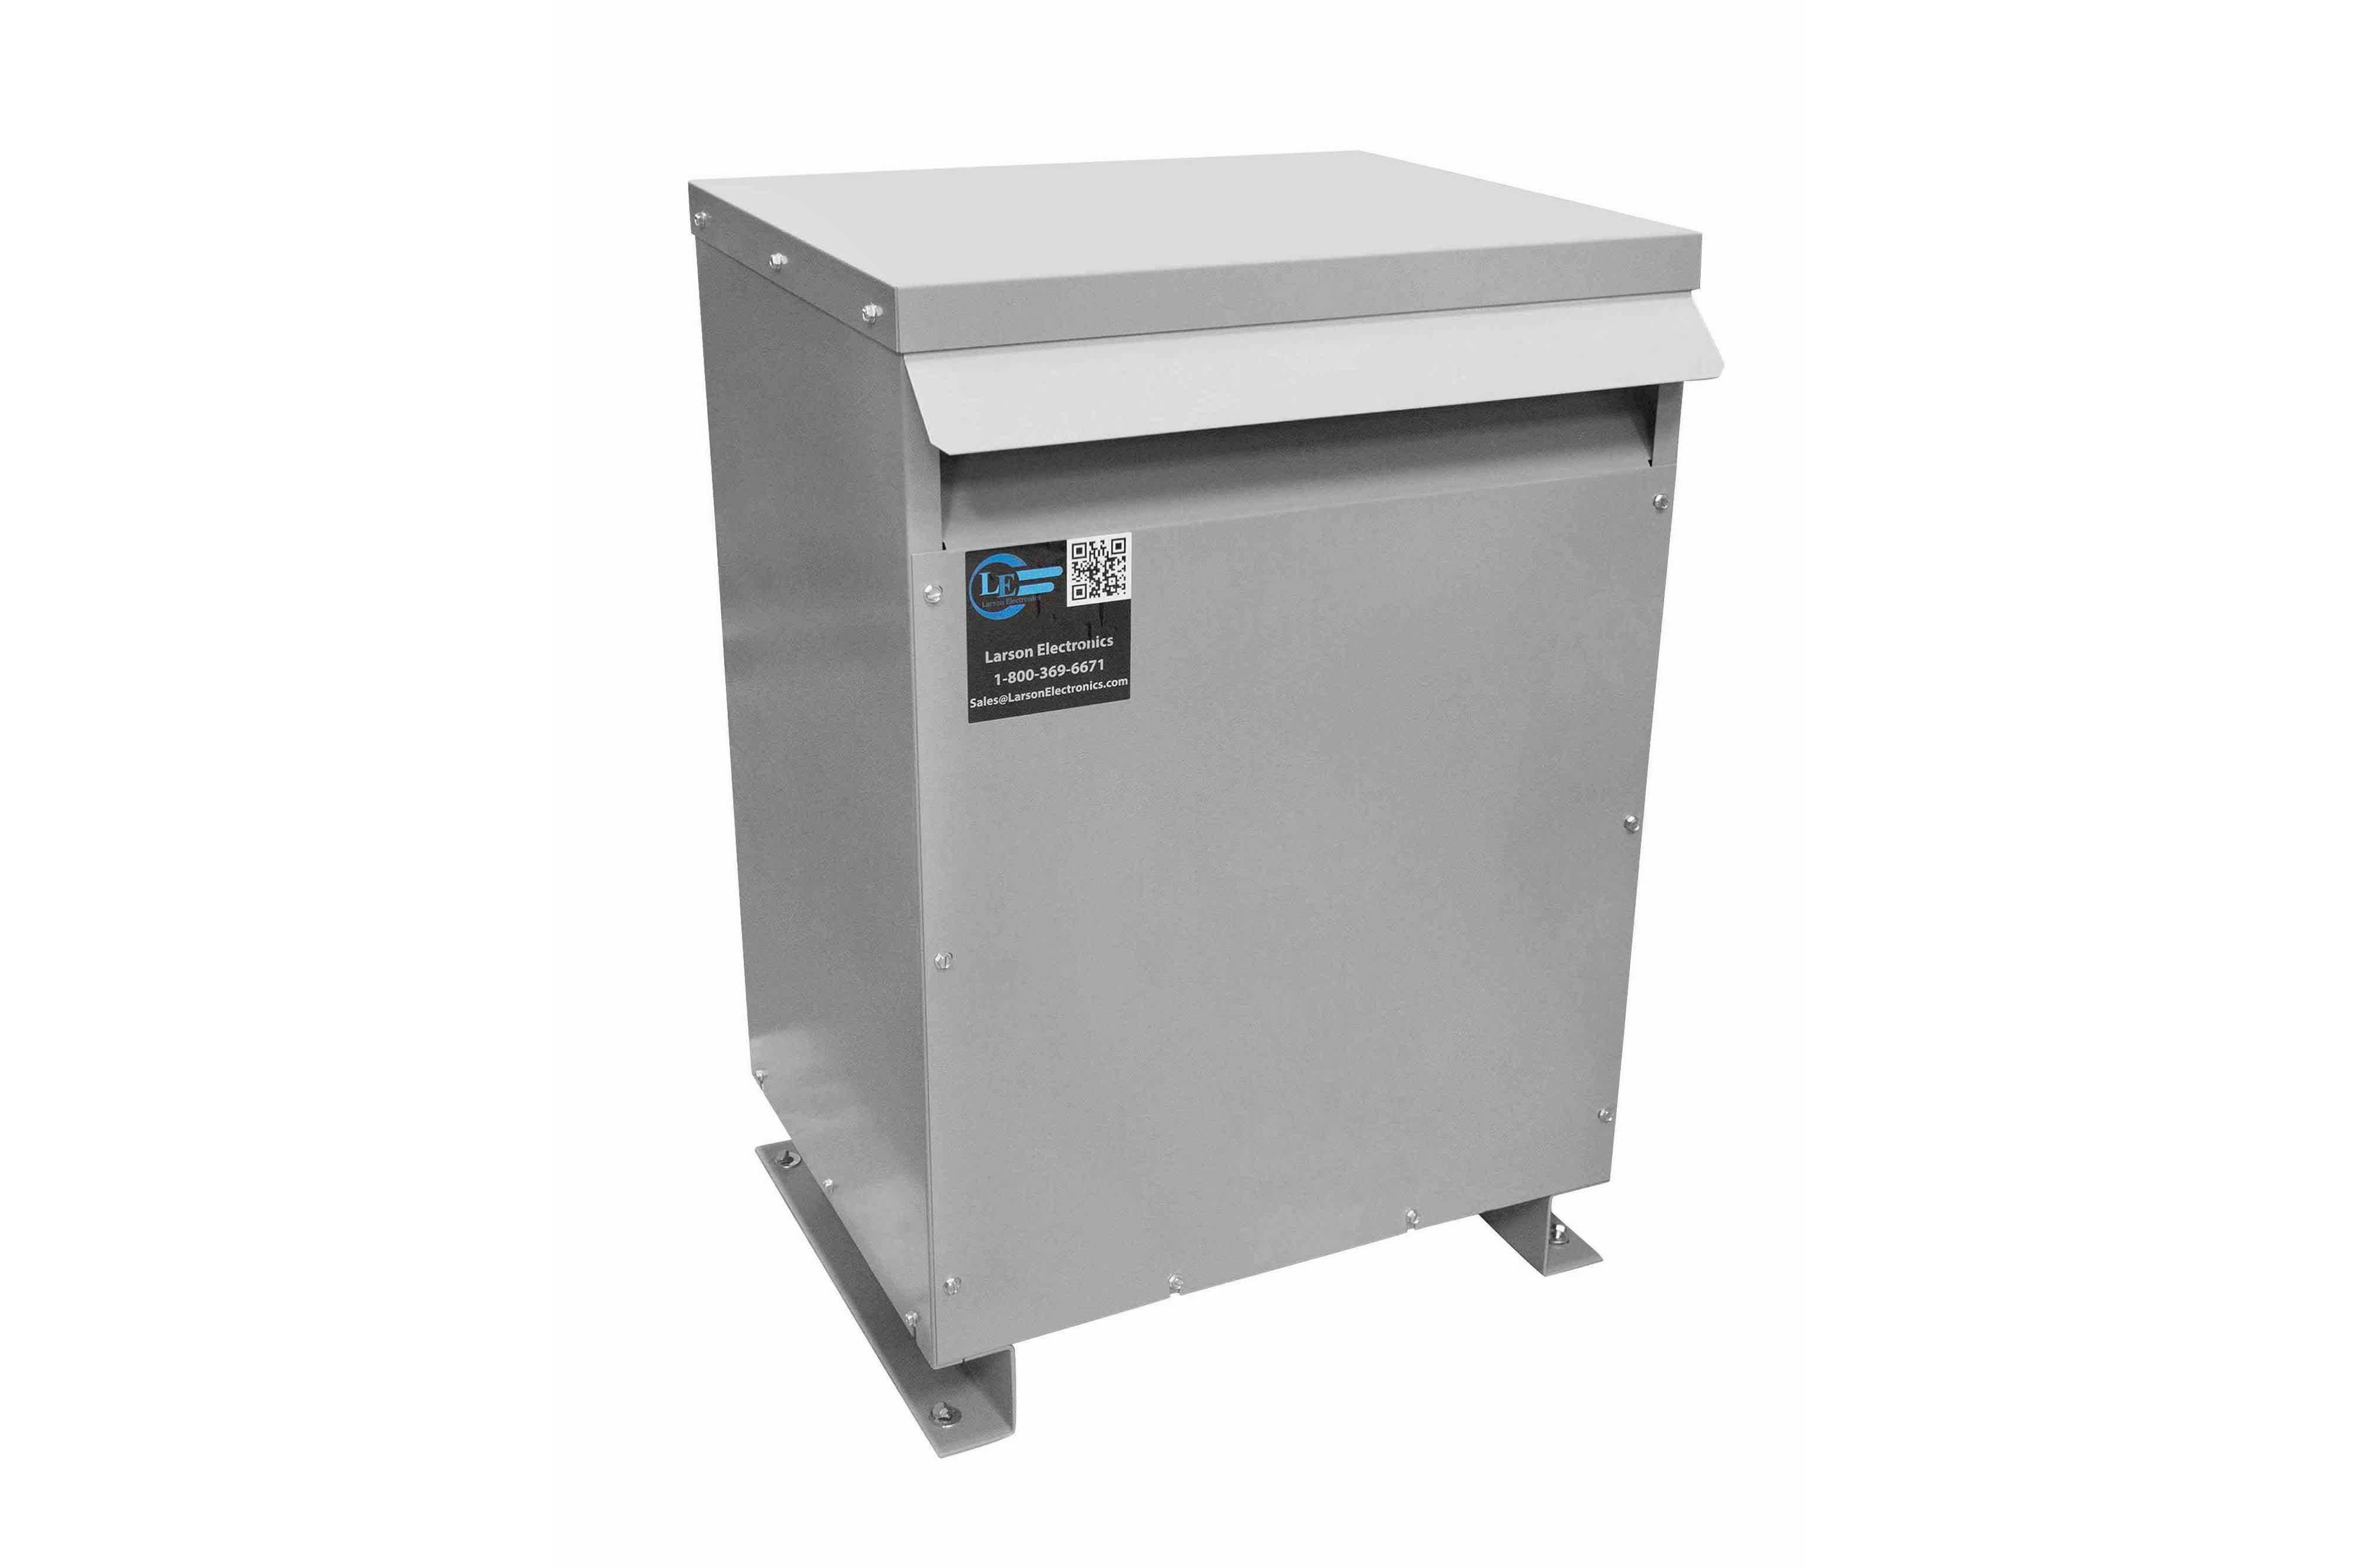 60 kVA 3PH Isolation Transformer, 460V Wye Primary, 400Y/231 Wye-N Secondary, N3R, Ventilated, 60 Hz